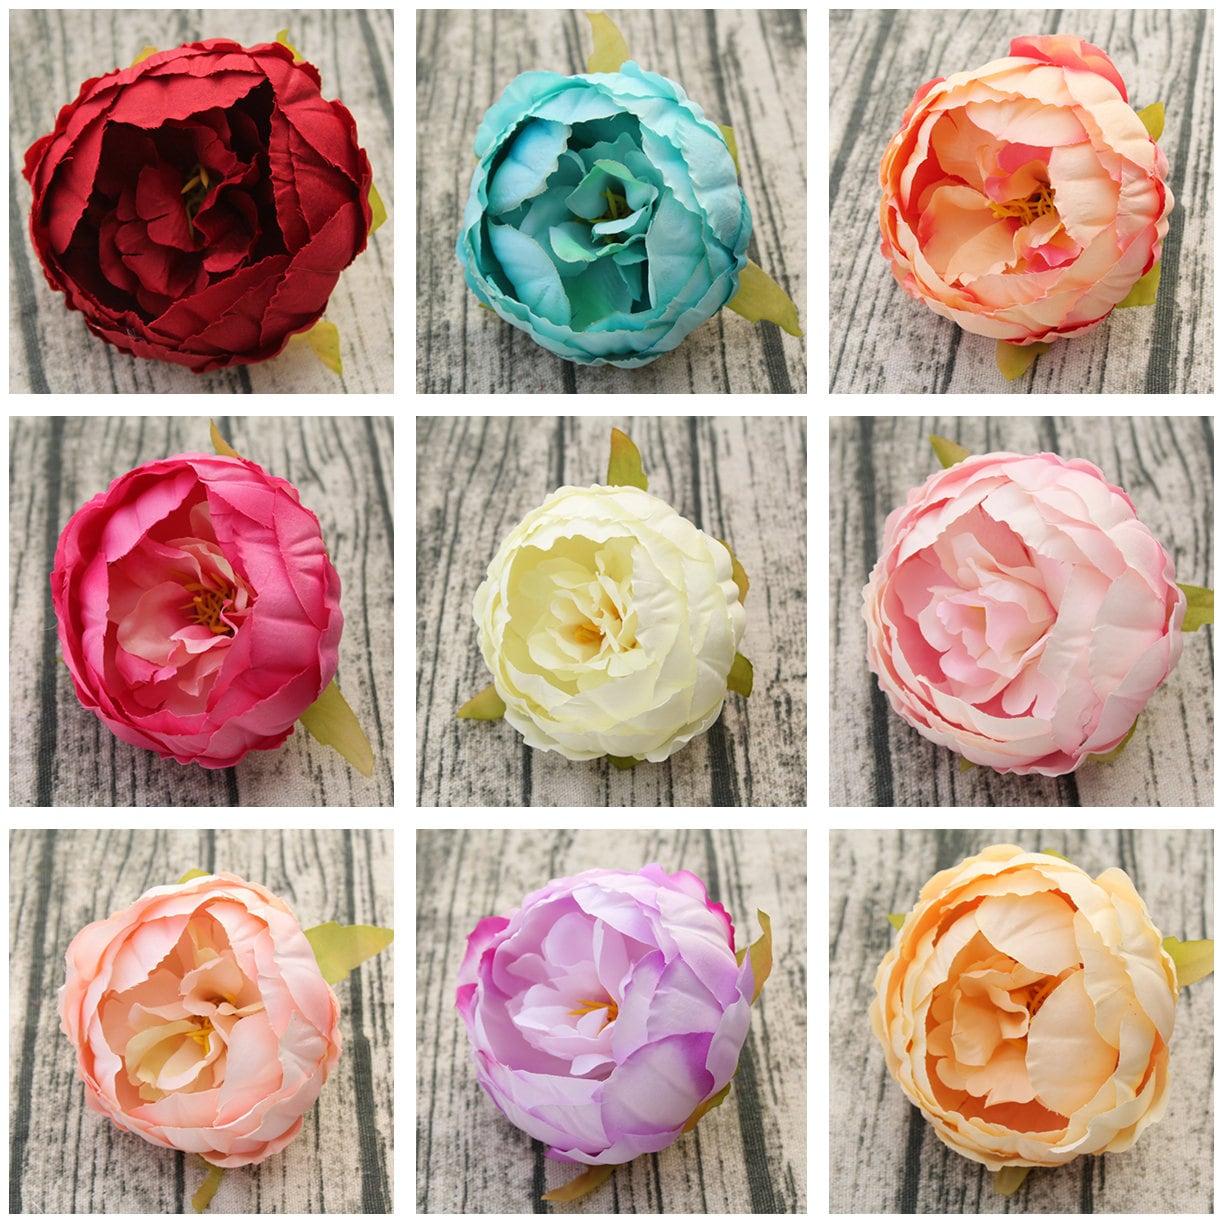 Wholesale Peony Flower Heads Artificial Silk Peonies 9cm 100 Etsy